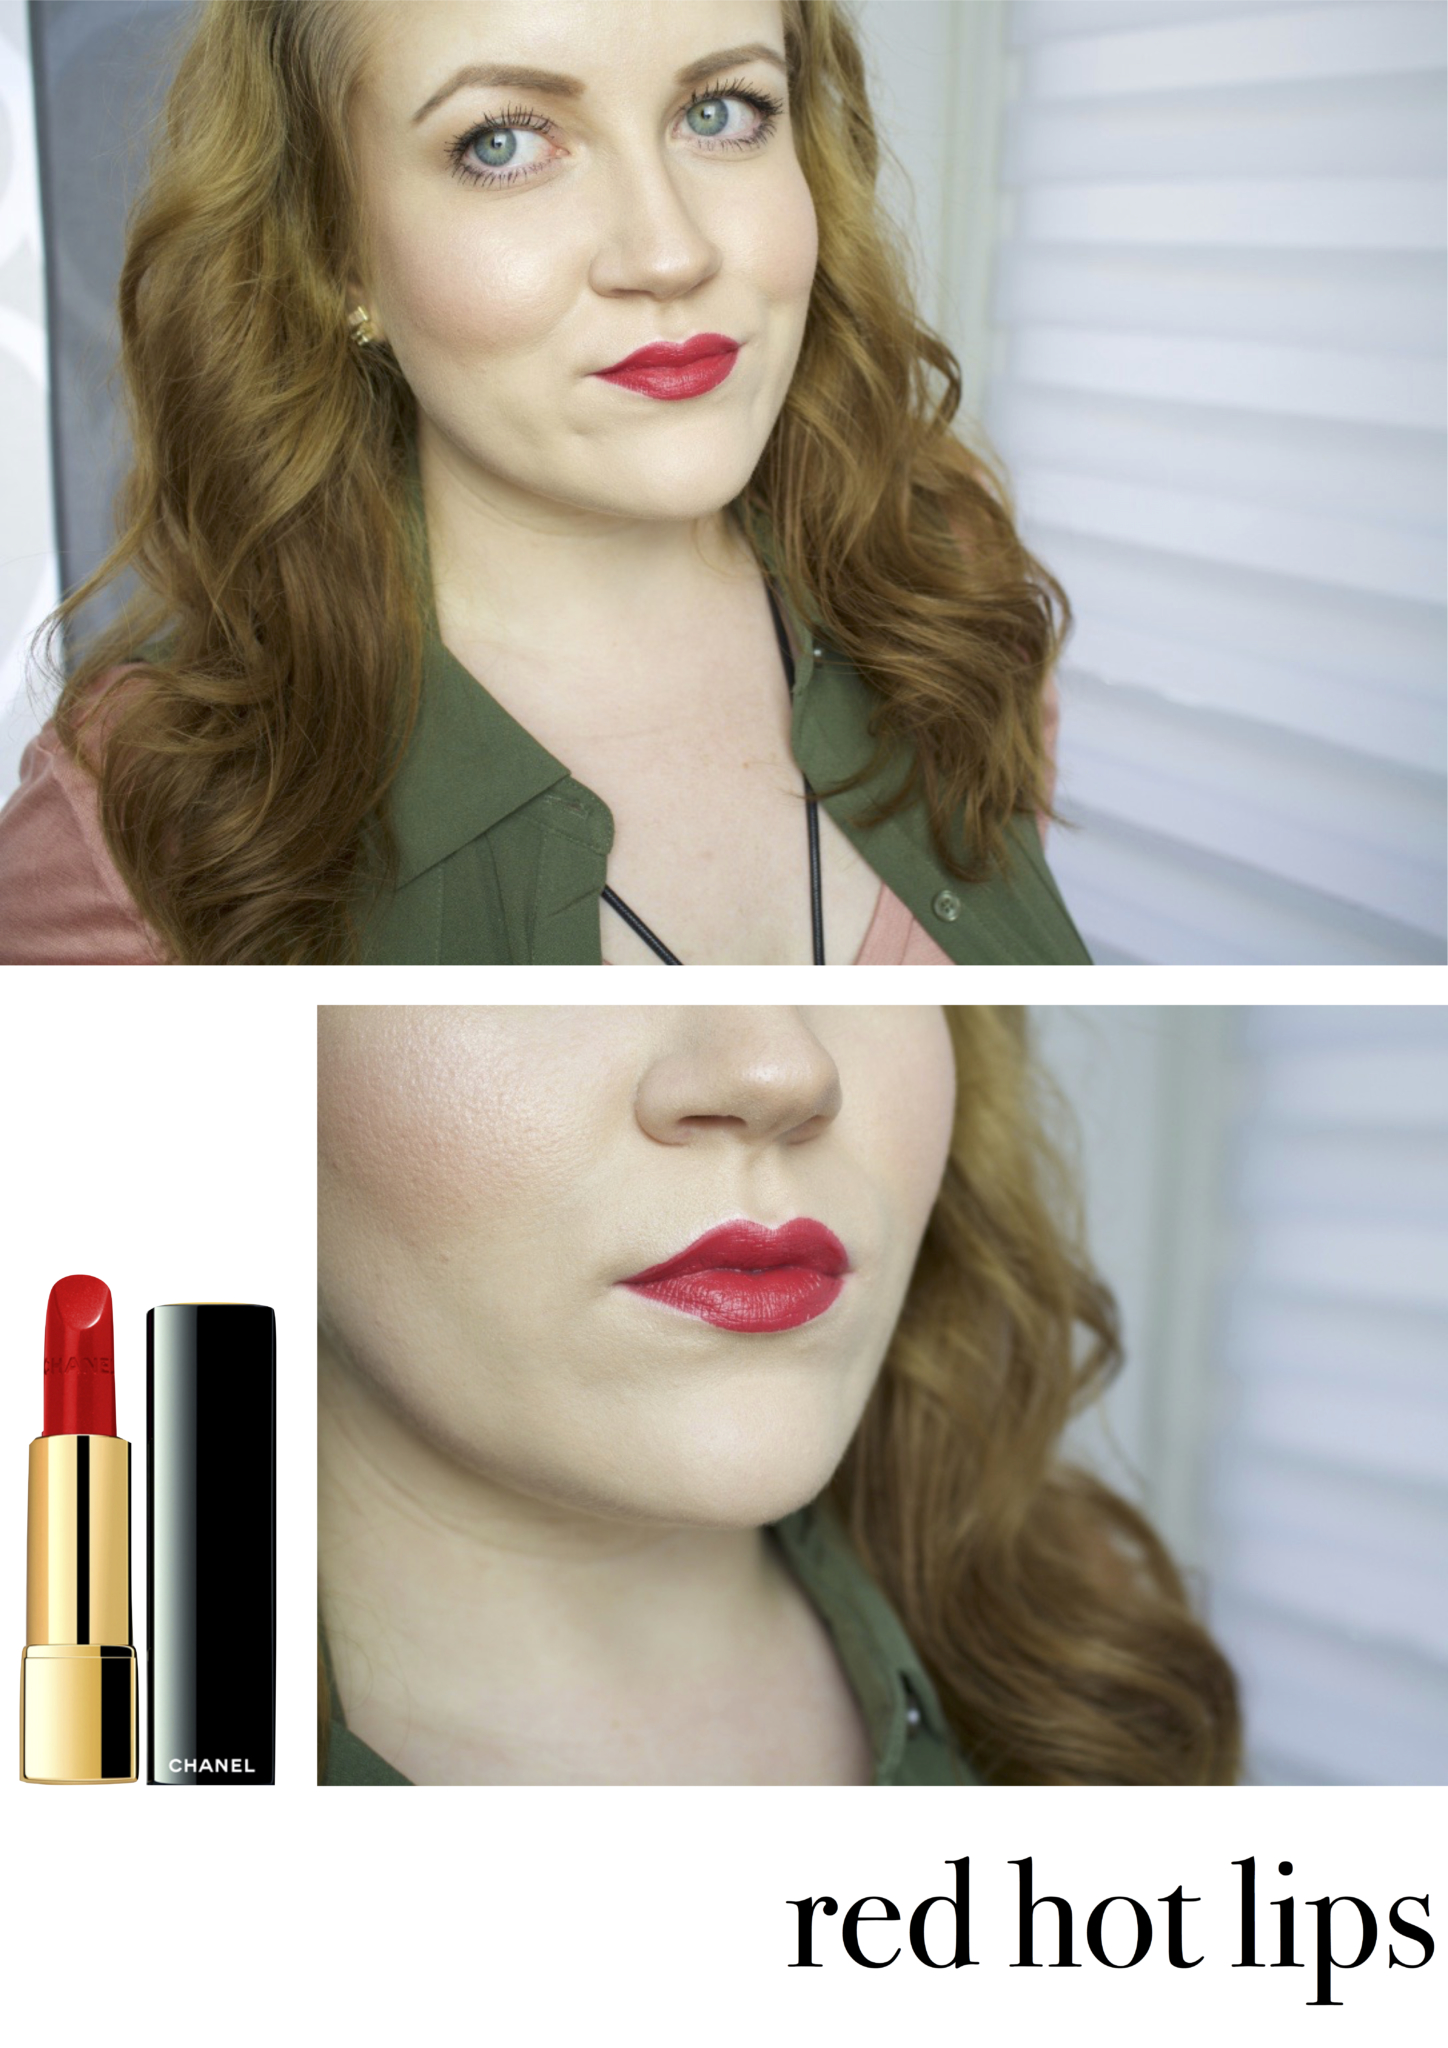 "Frühlings make-up Look Nummer 2 für Rothaarige - Frühlings-Lippenstifte für Rothaarige: Drogerie vs. High End - Blogreihe ""typgerecht"" - Beauty Blog Leipzig"